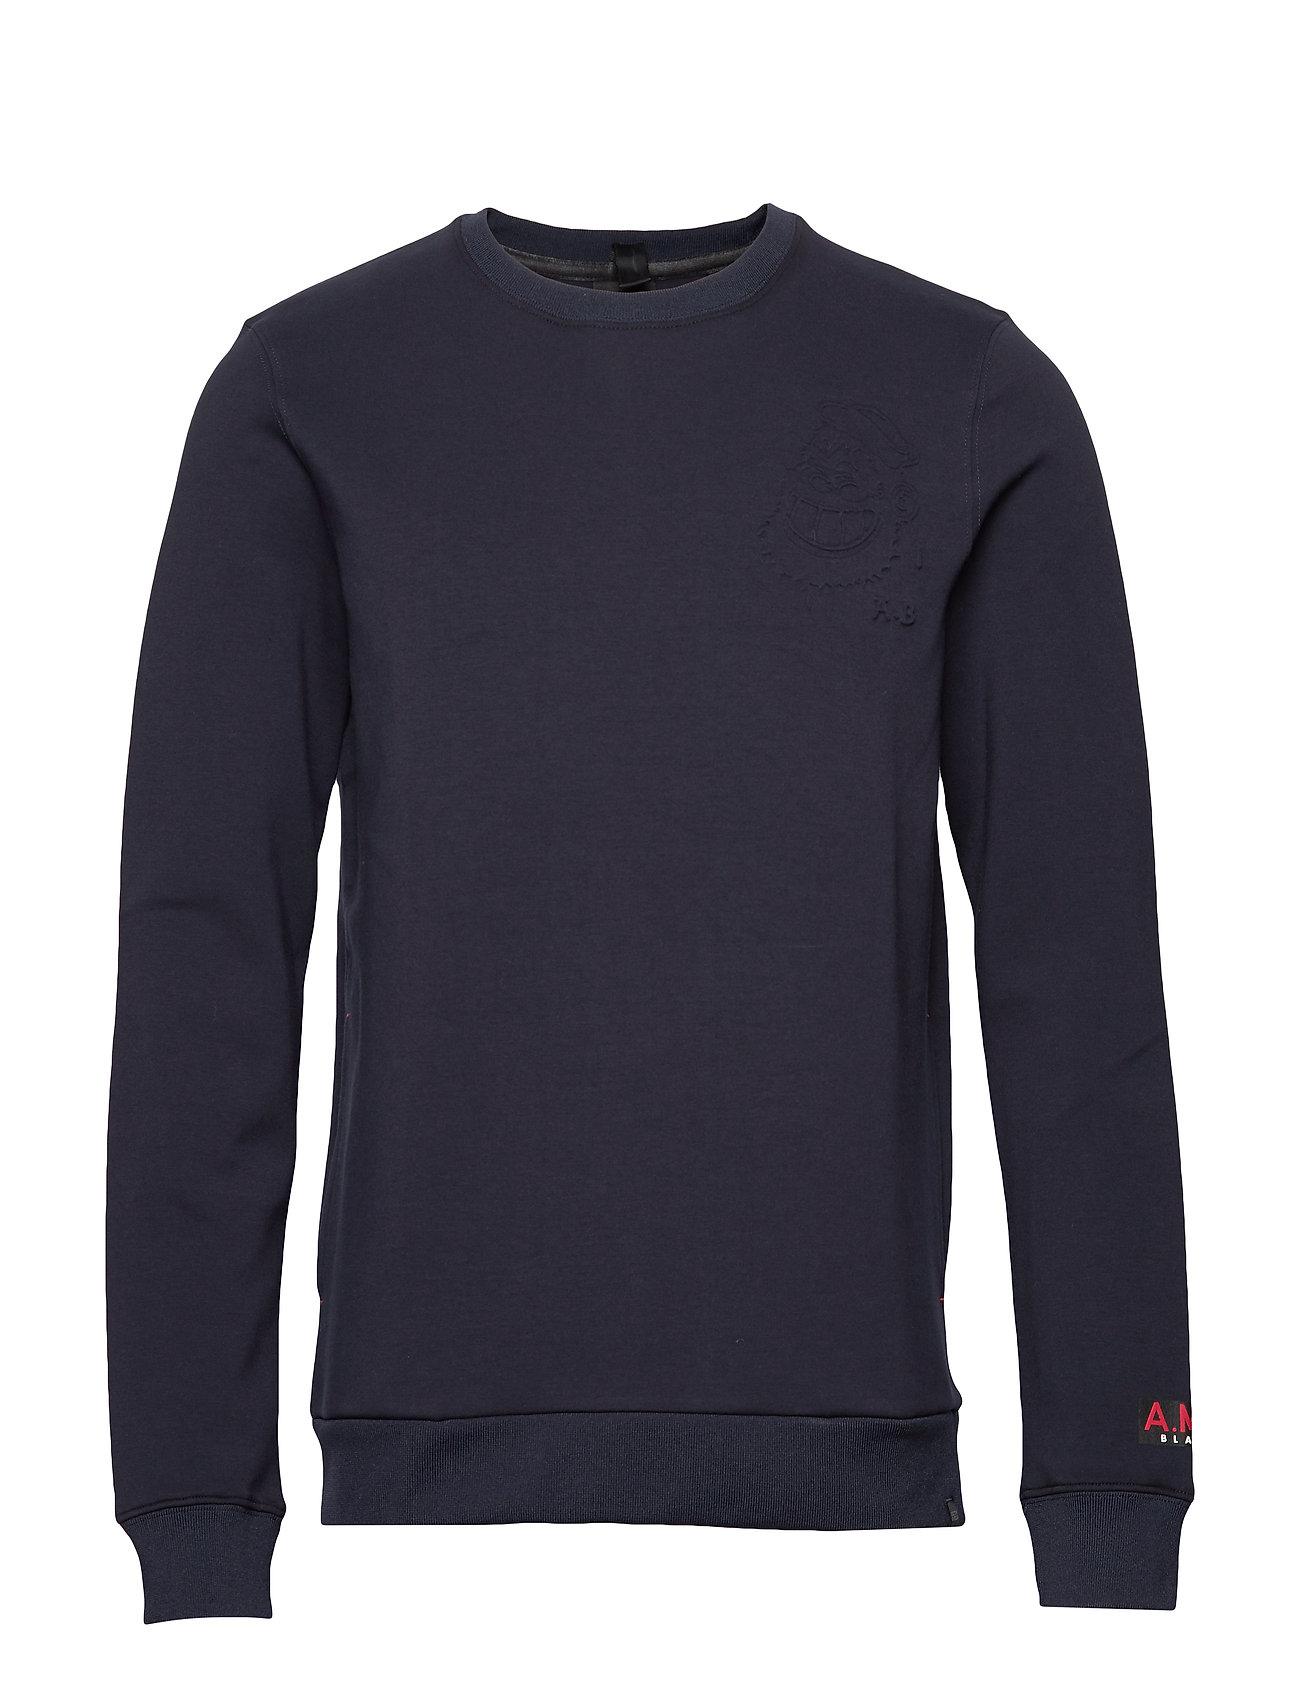 SCOTCH & SODA Sportunterteile | Brutus Ams Blauw Colab Sweat With Detachable Bandana Sweat-shirt Pullover Blau SCOTCH & SODA